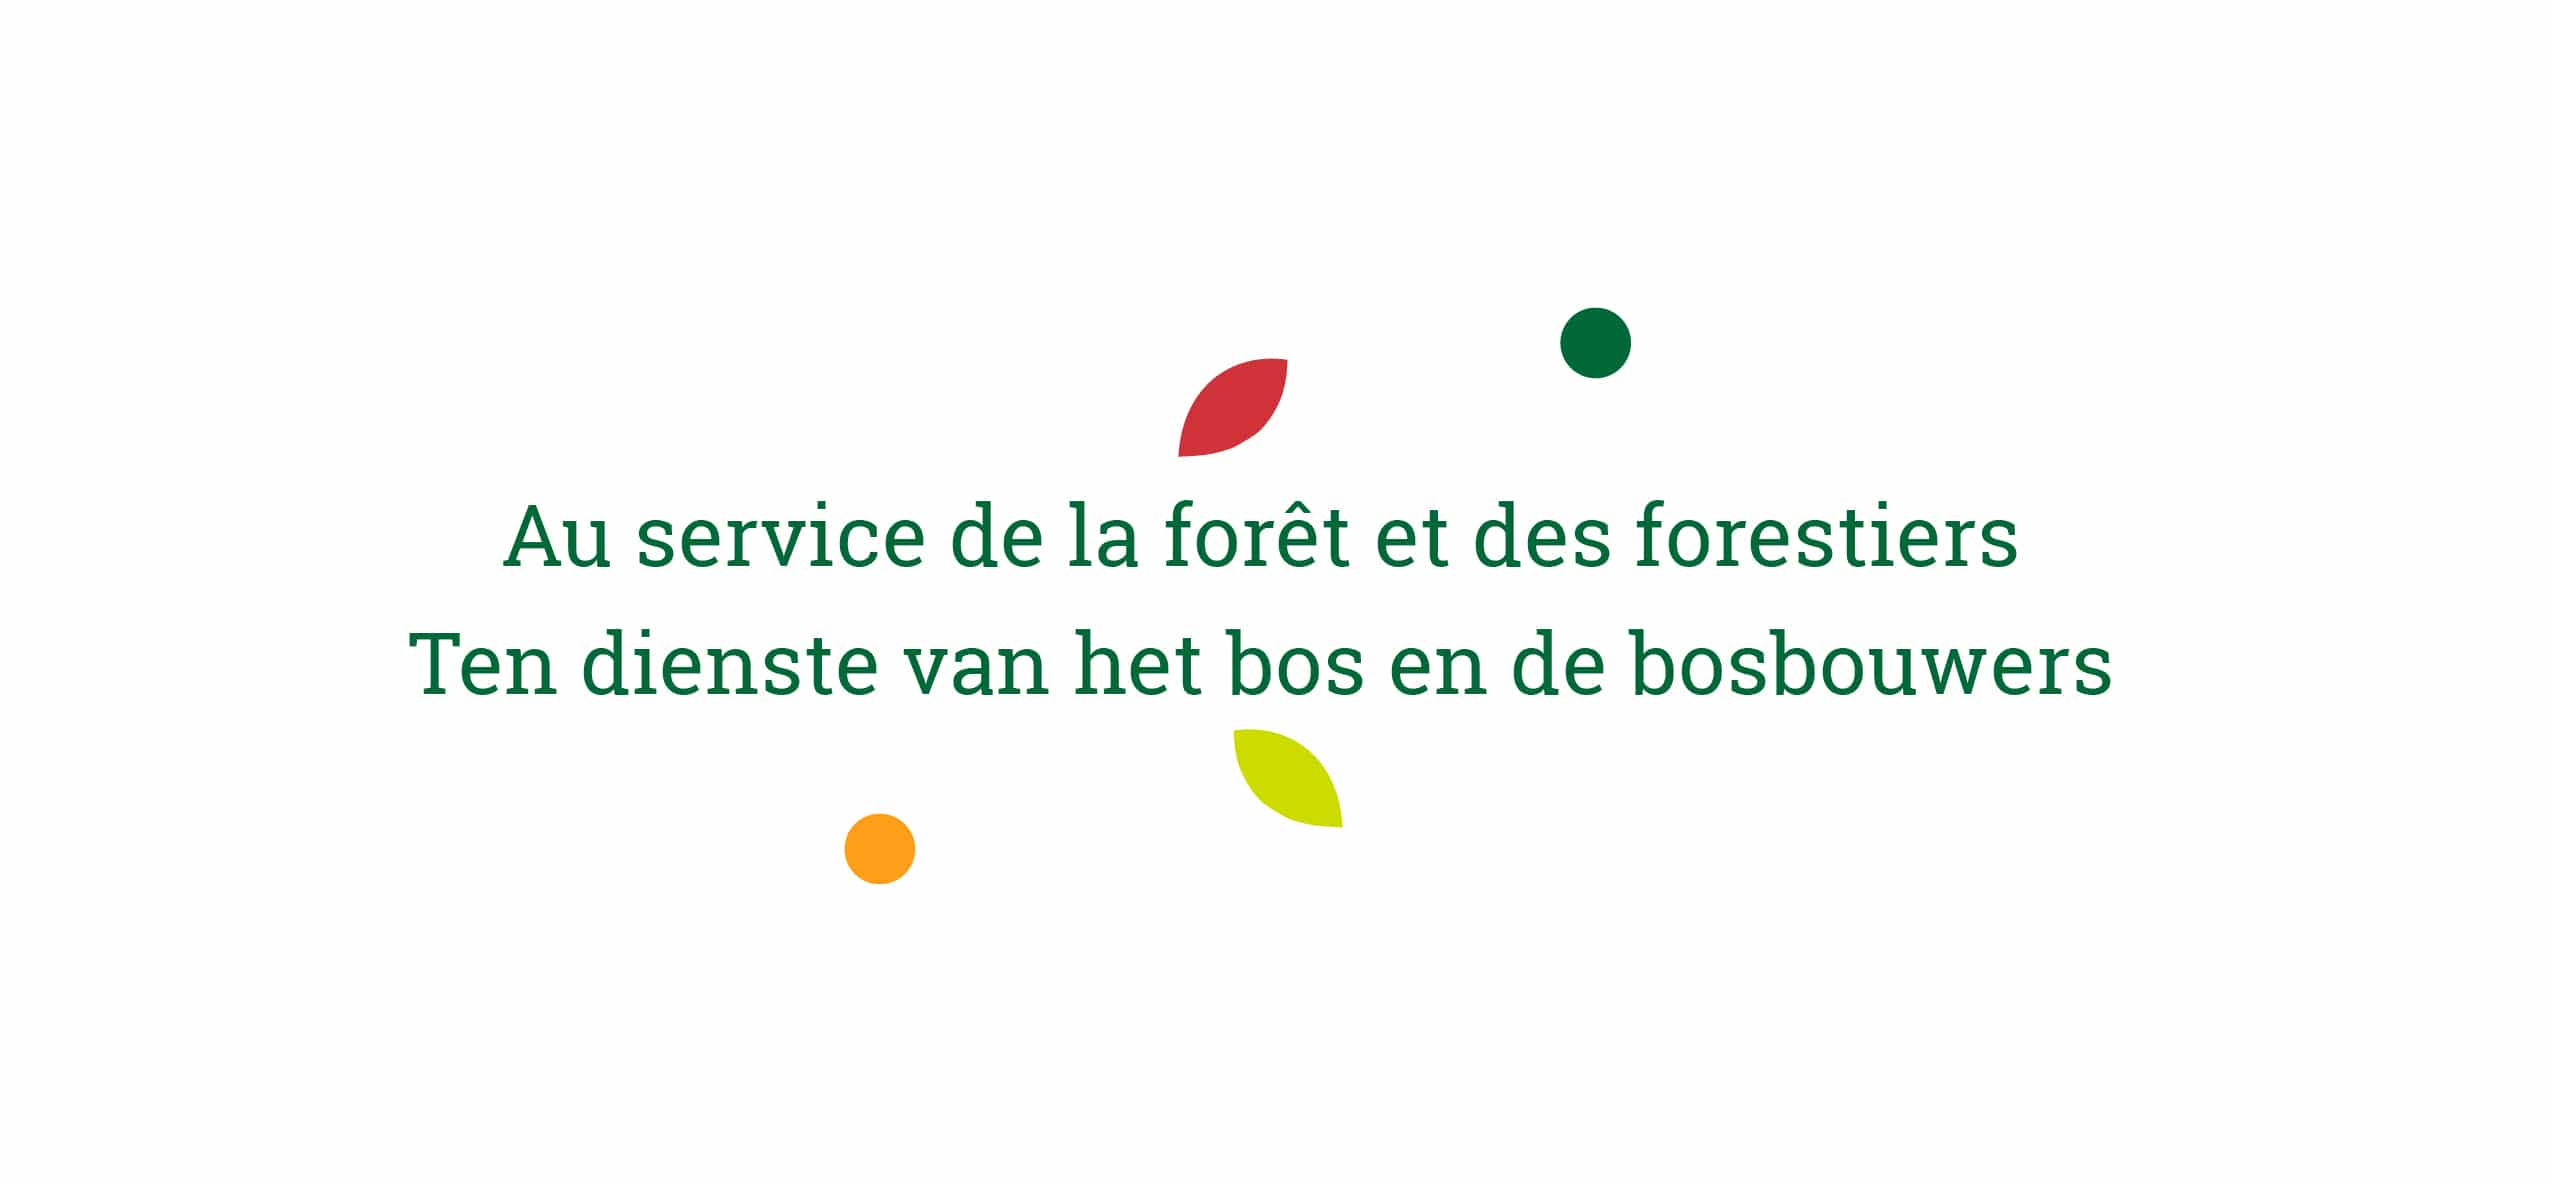 Baseline van SRFB-KBBM - Au service de la forêt et des forestiers - Ten dienst van het bos en de bosbouwers